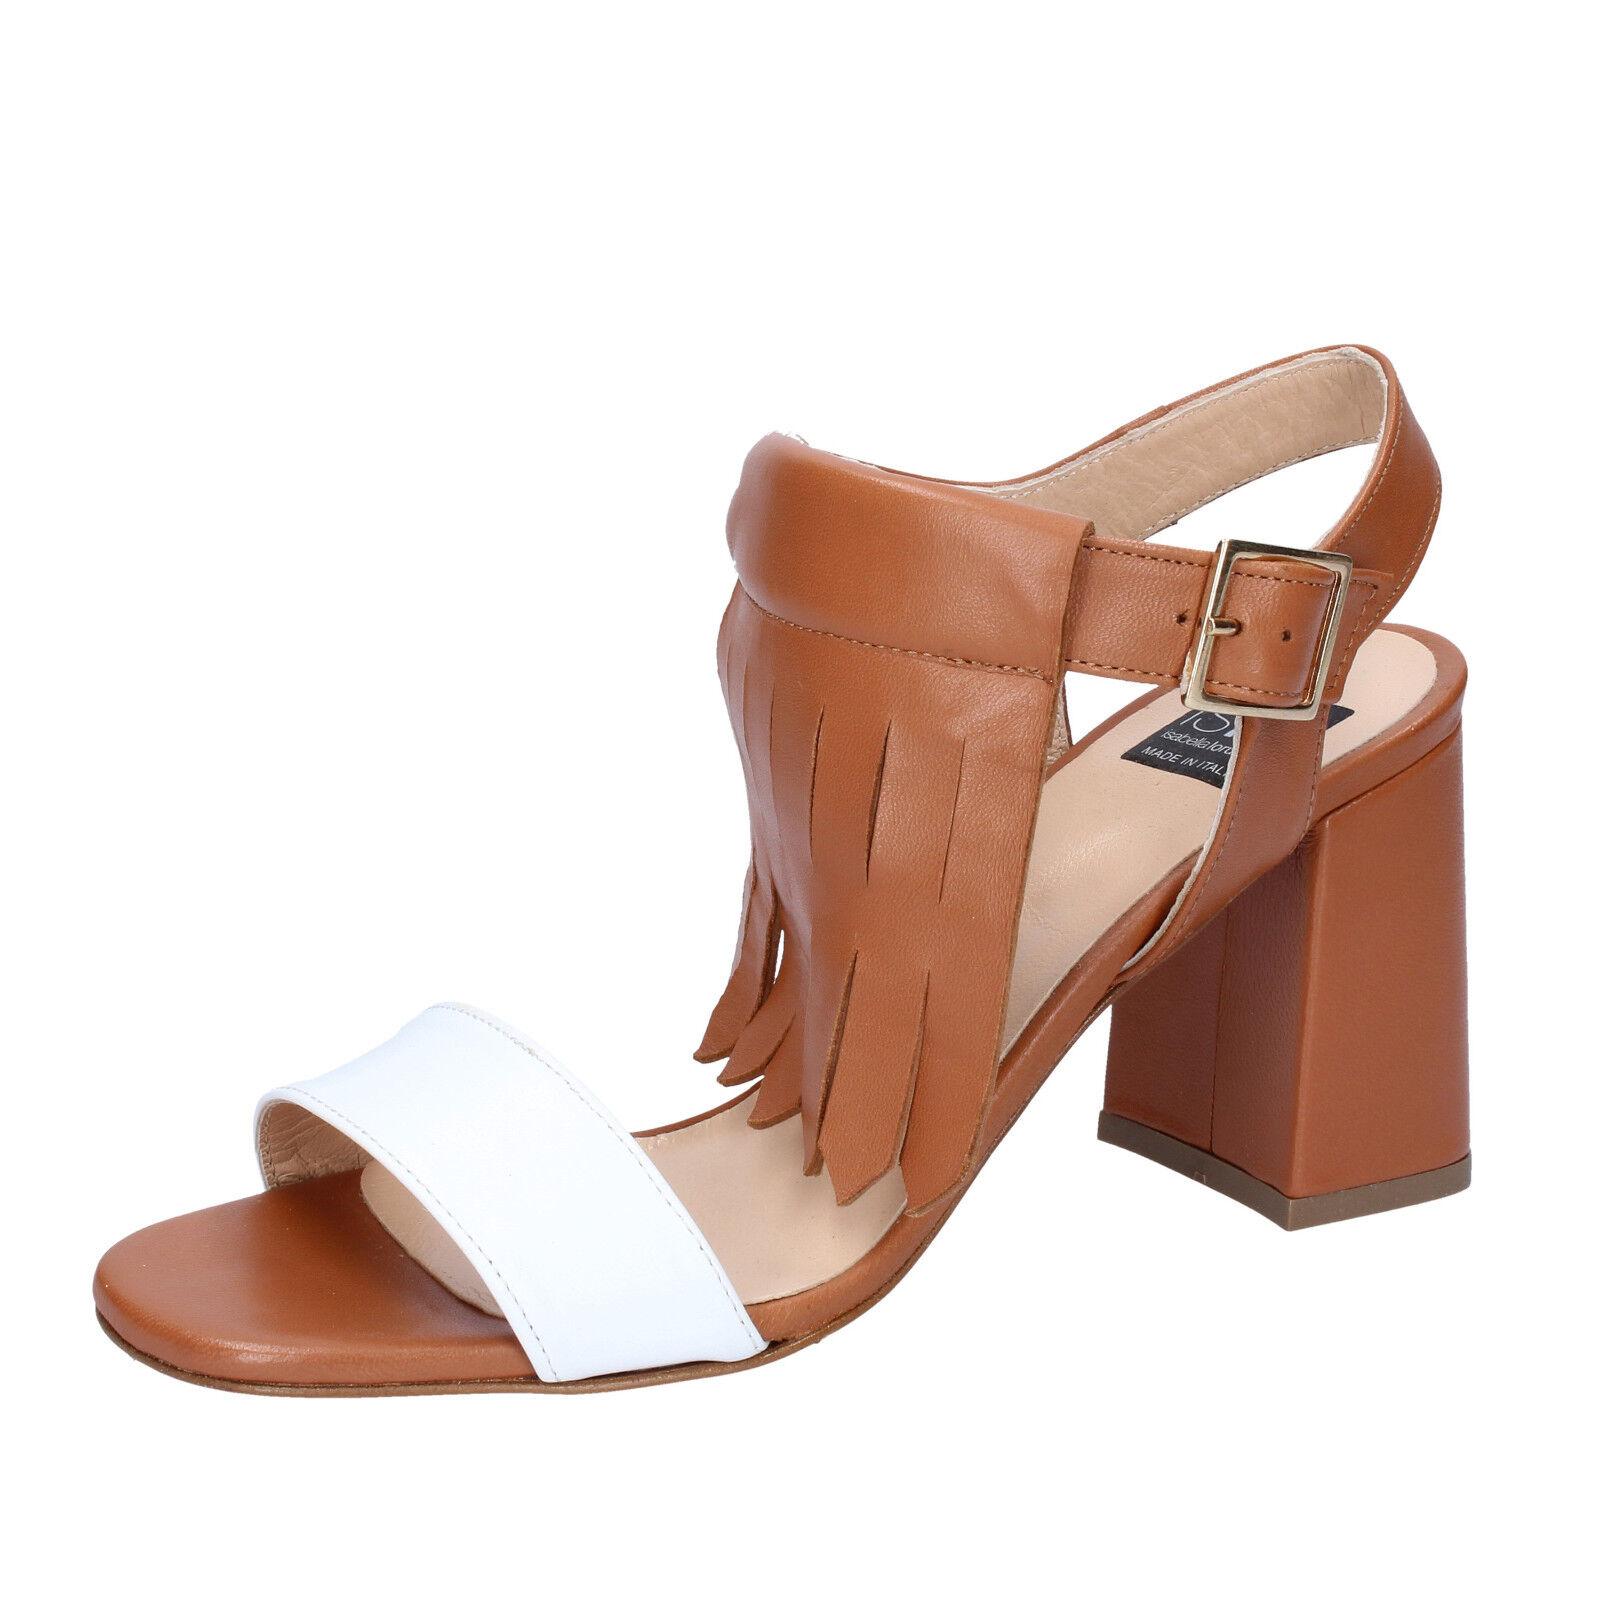 scarpe donna ISLO ISABELLA marrone LORUSSO 39 EU sandali marrone ISABELLA bianco pelle BZ332-D 7d5050